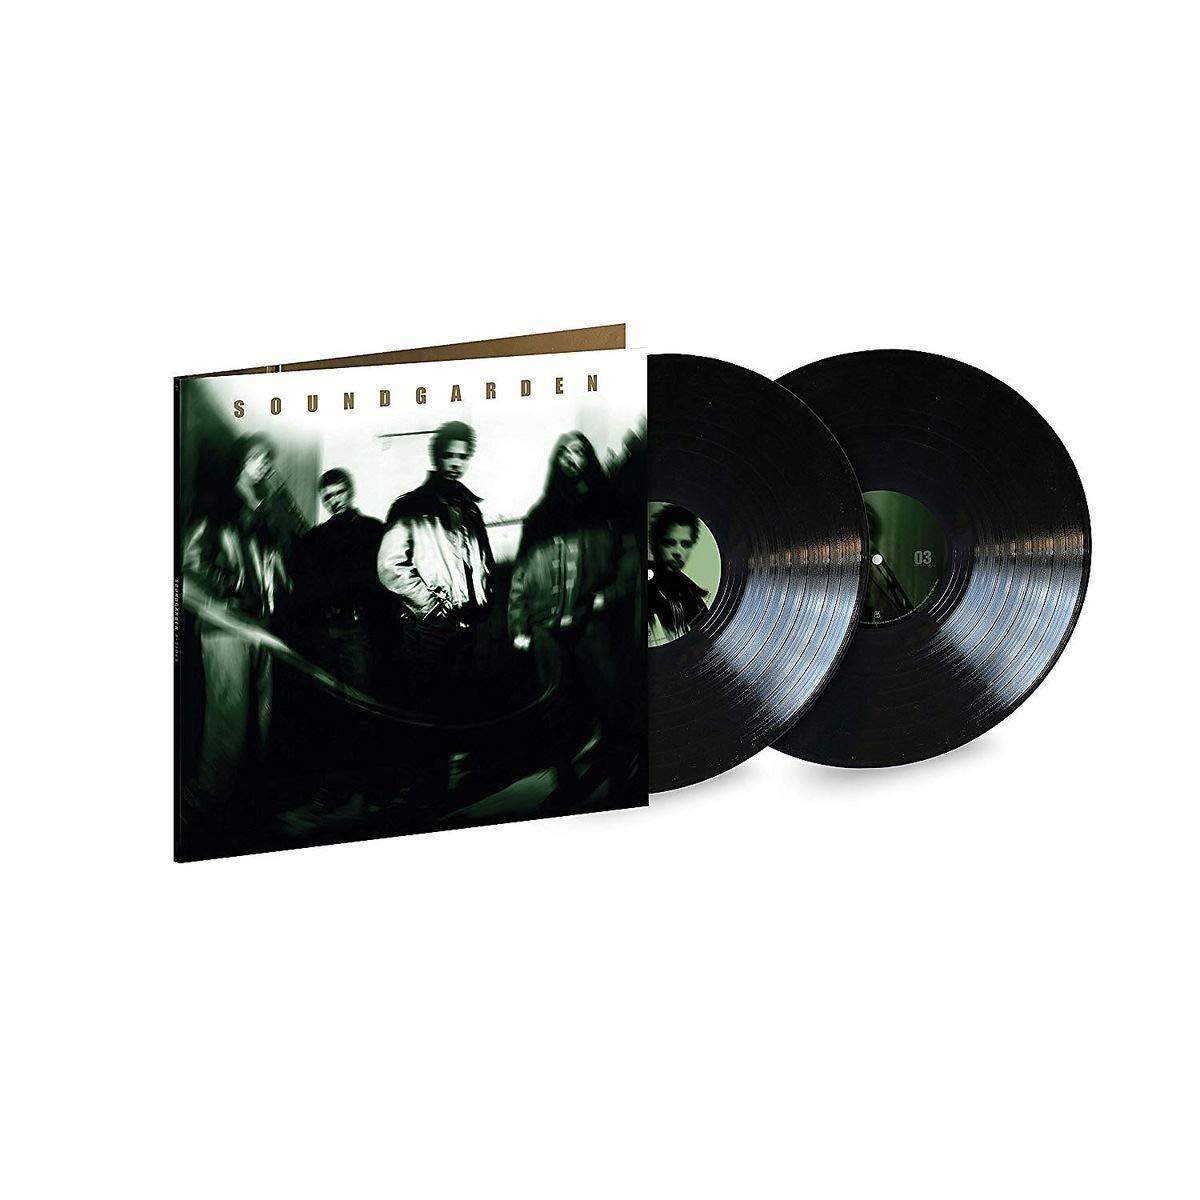 Soundgarden Soundgarden. A-Sides (2 LP) soundgarden soundgarden echo of miles scattered tracks across